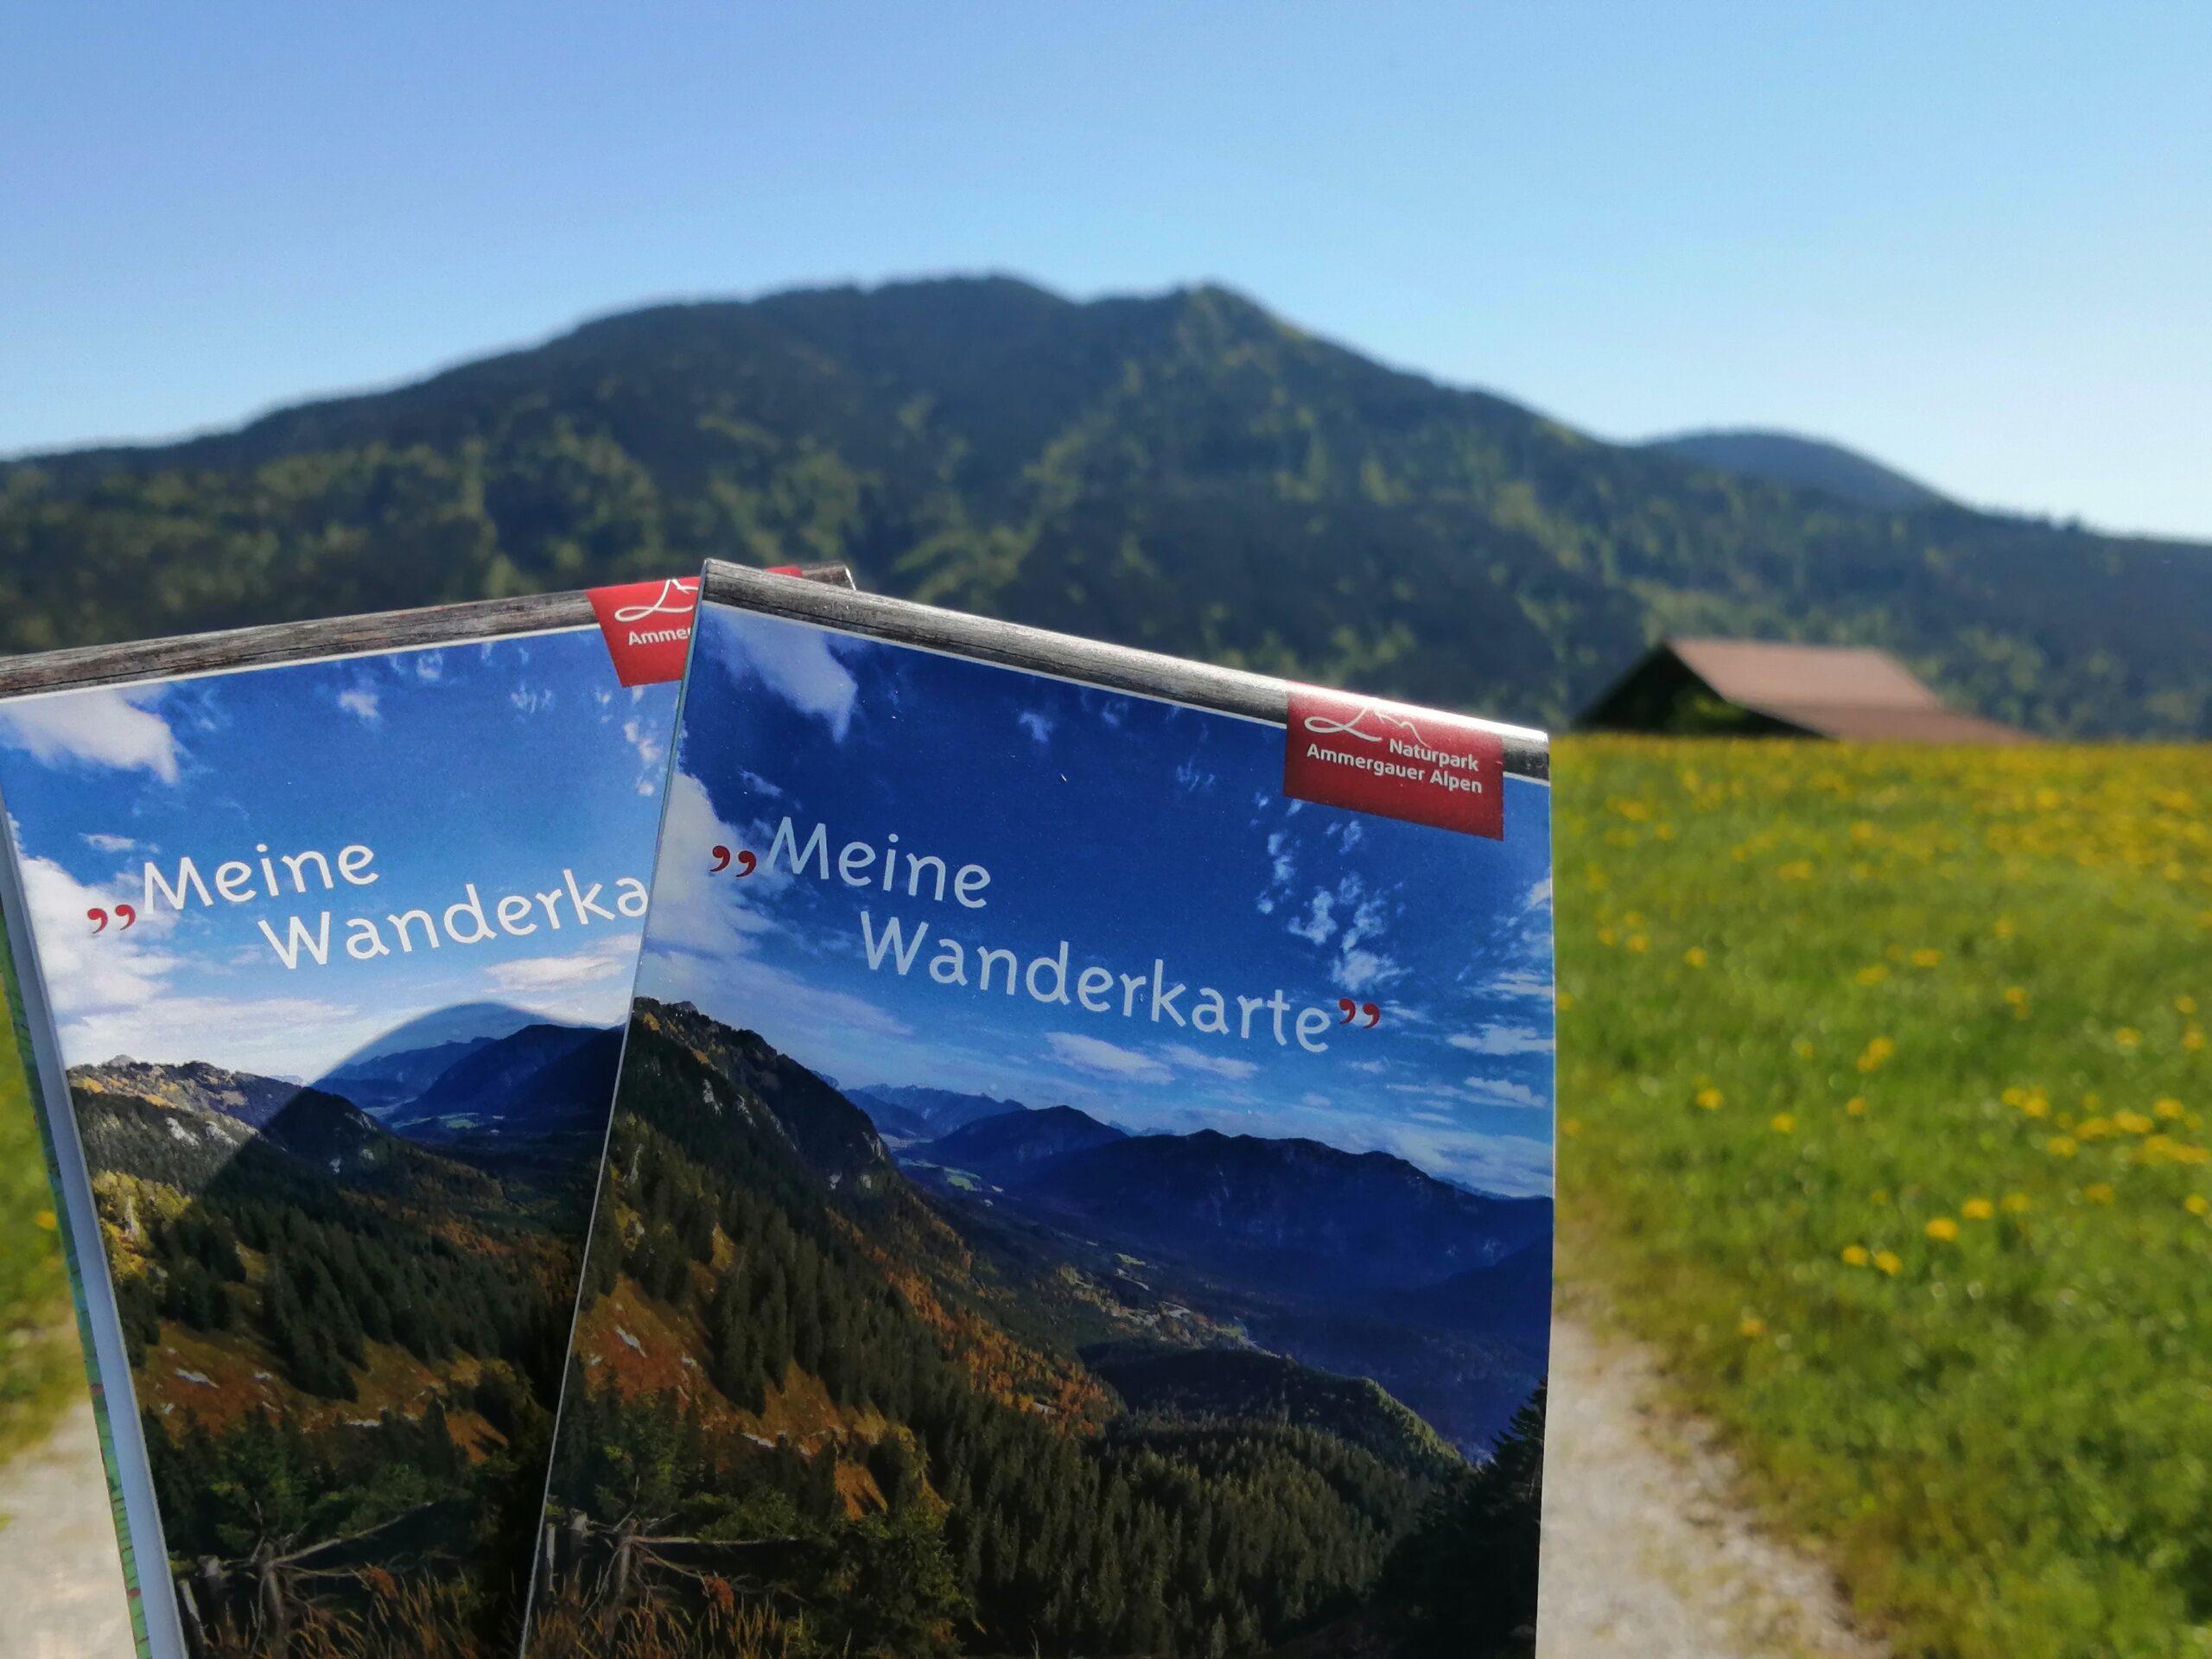 Wanderkarte Wasserfest- Wiesendanger medien Druckerei UV-Offset